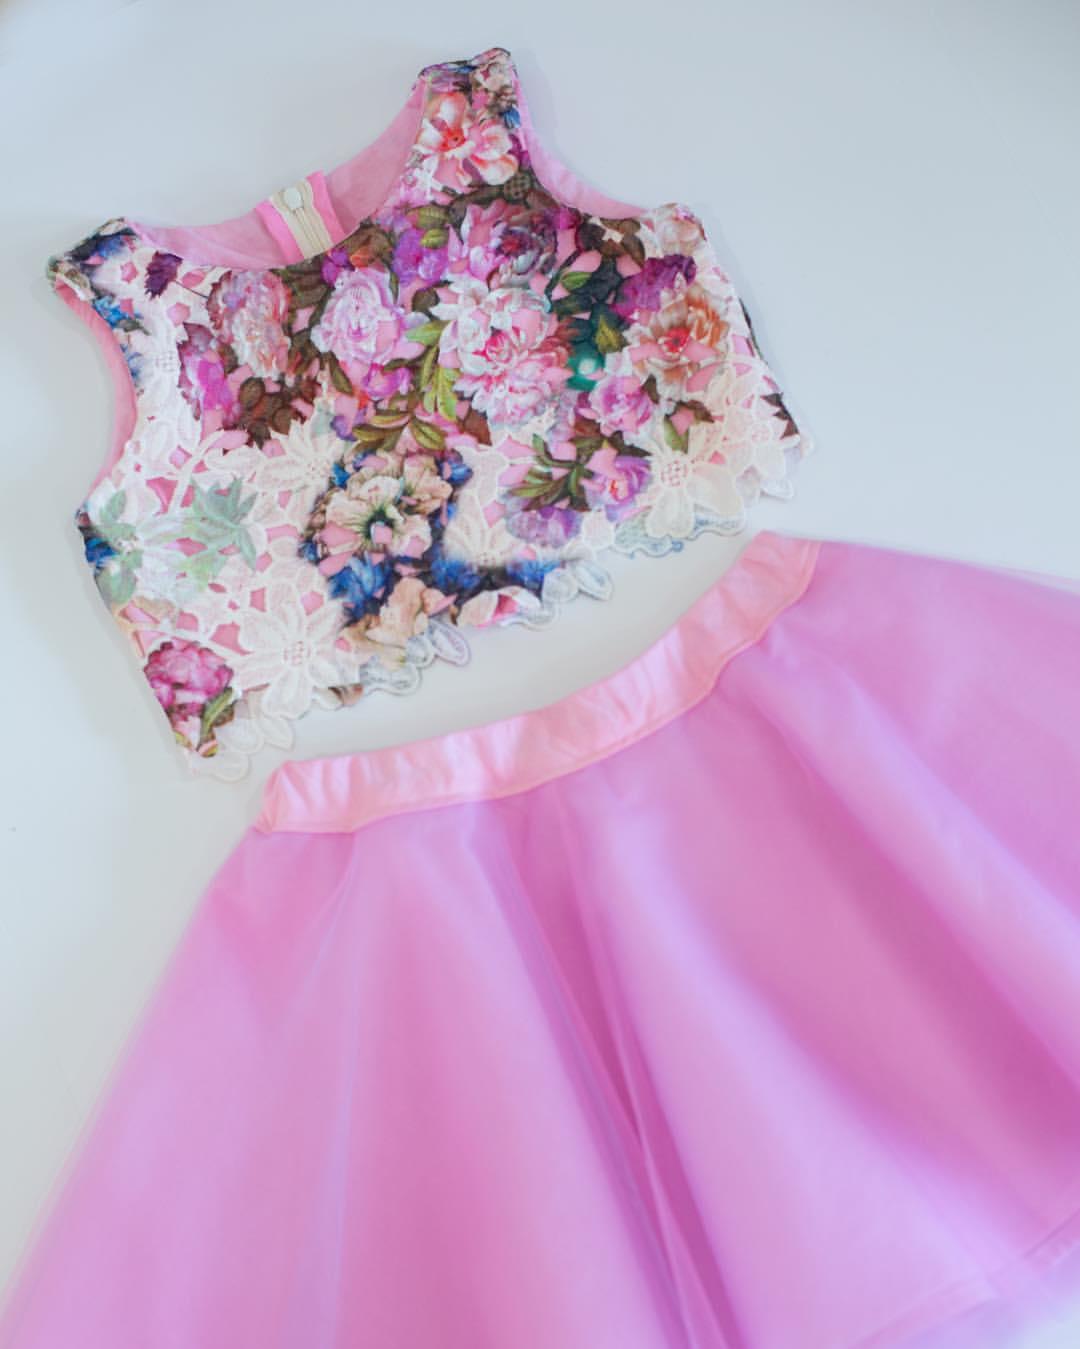 Handmade 5th Birthday Outfit - Lovemade Handmade